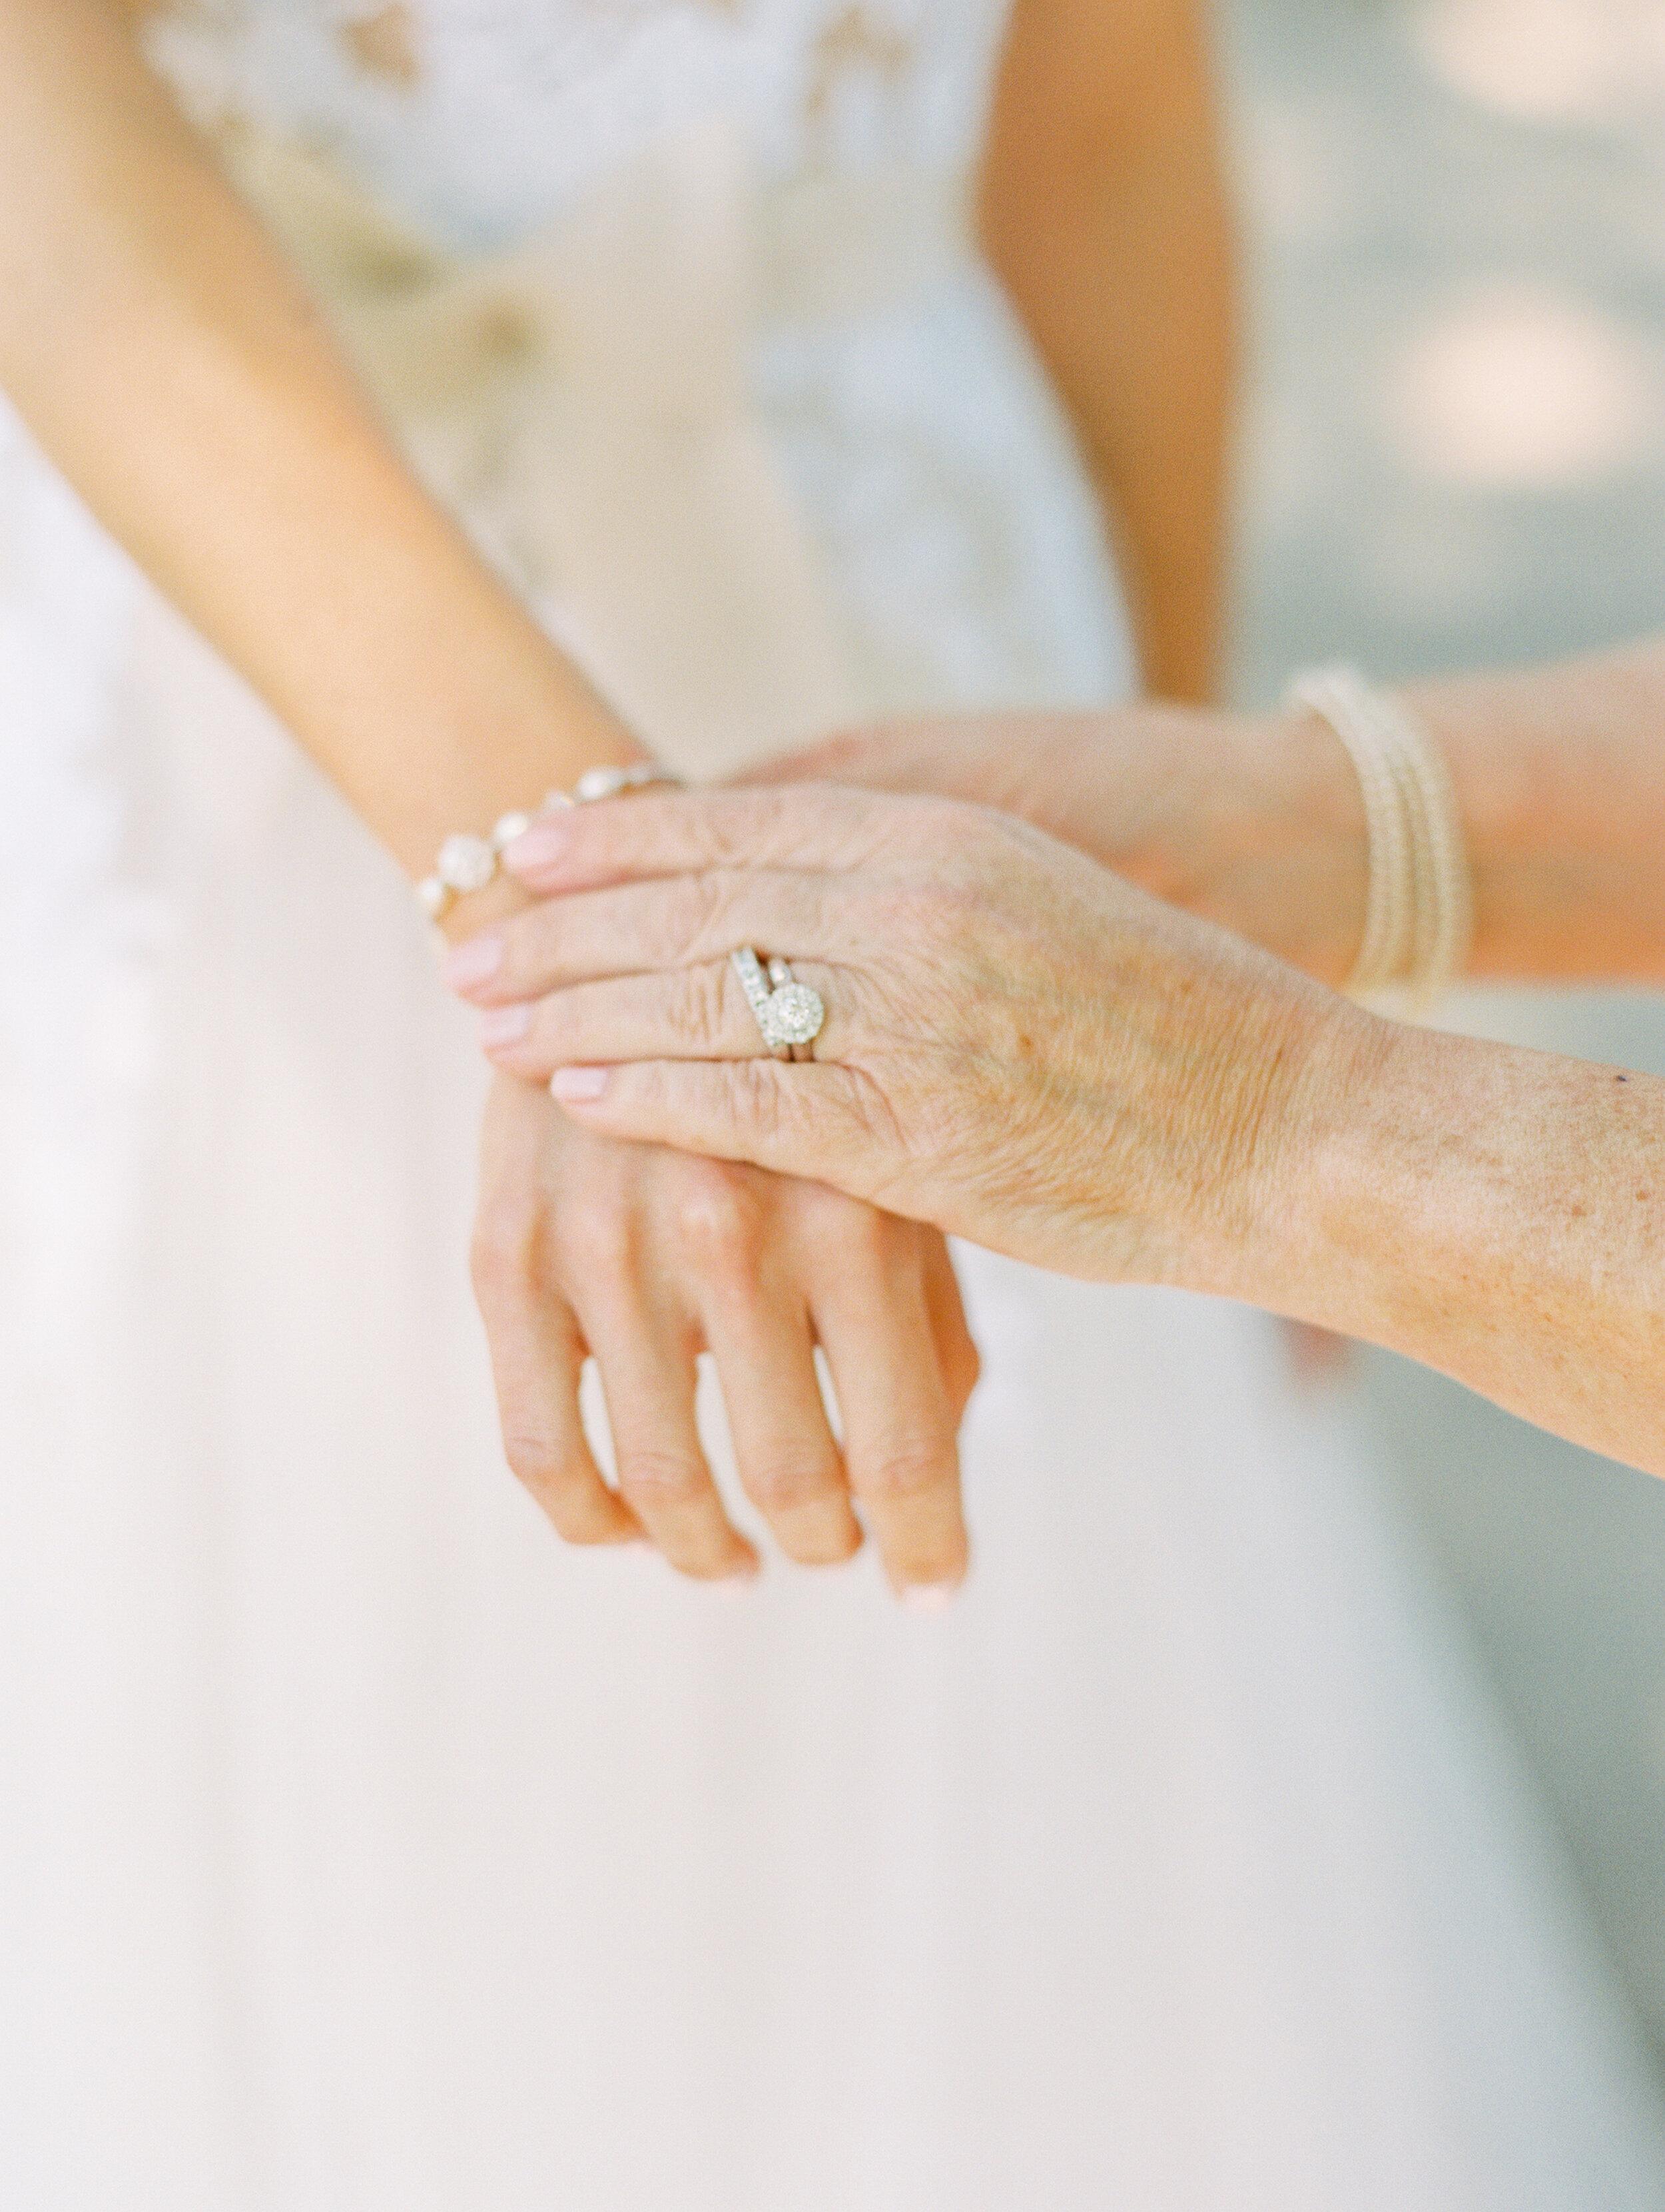 Steinlage+Wedding+Getting+Ready-102.jpg